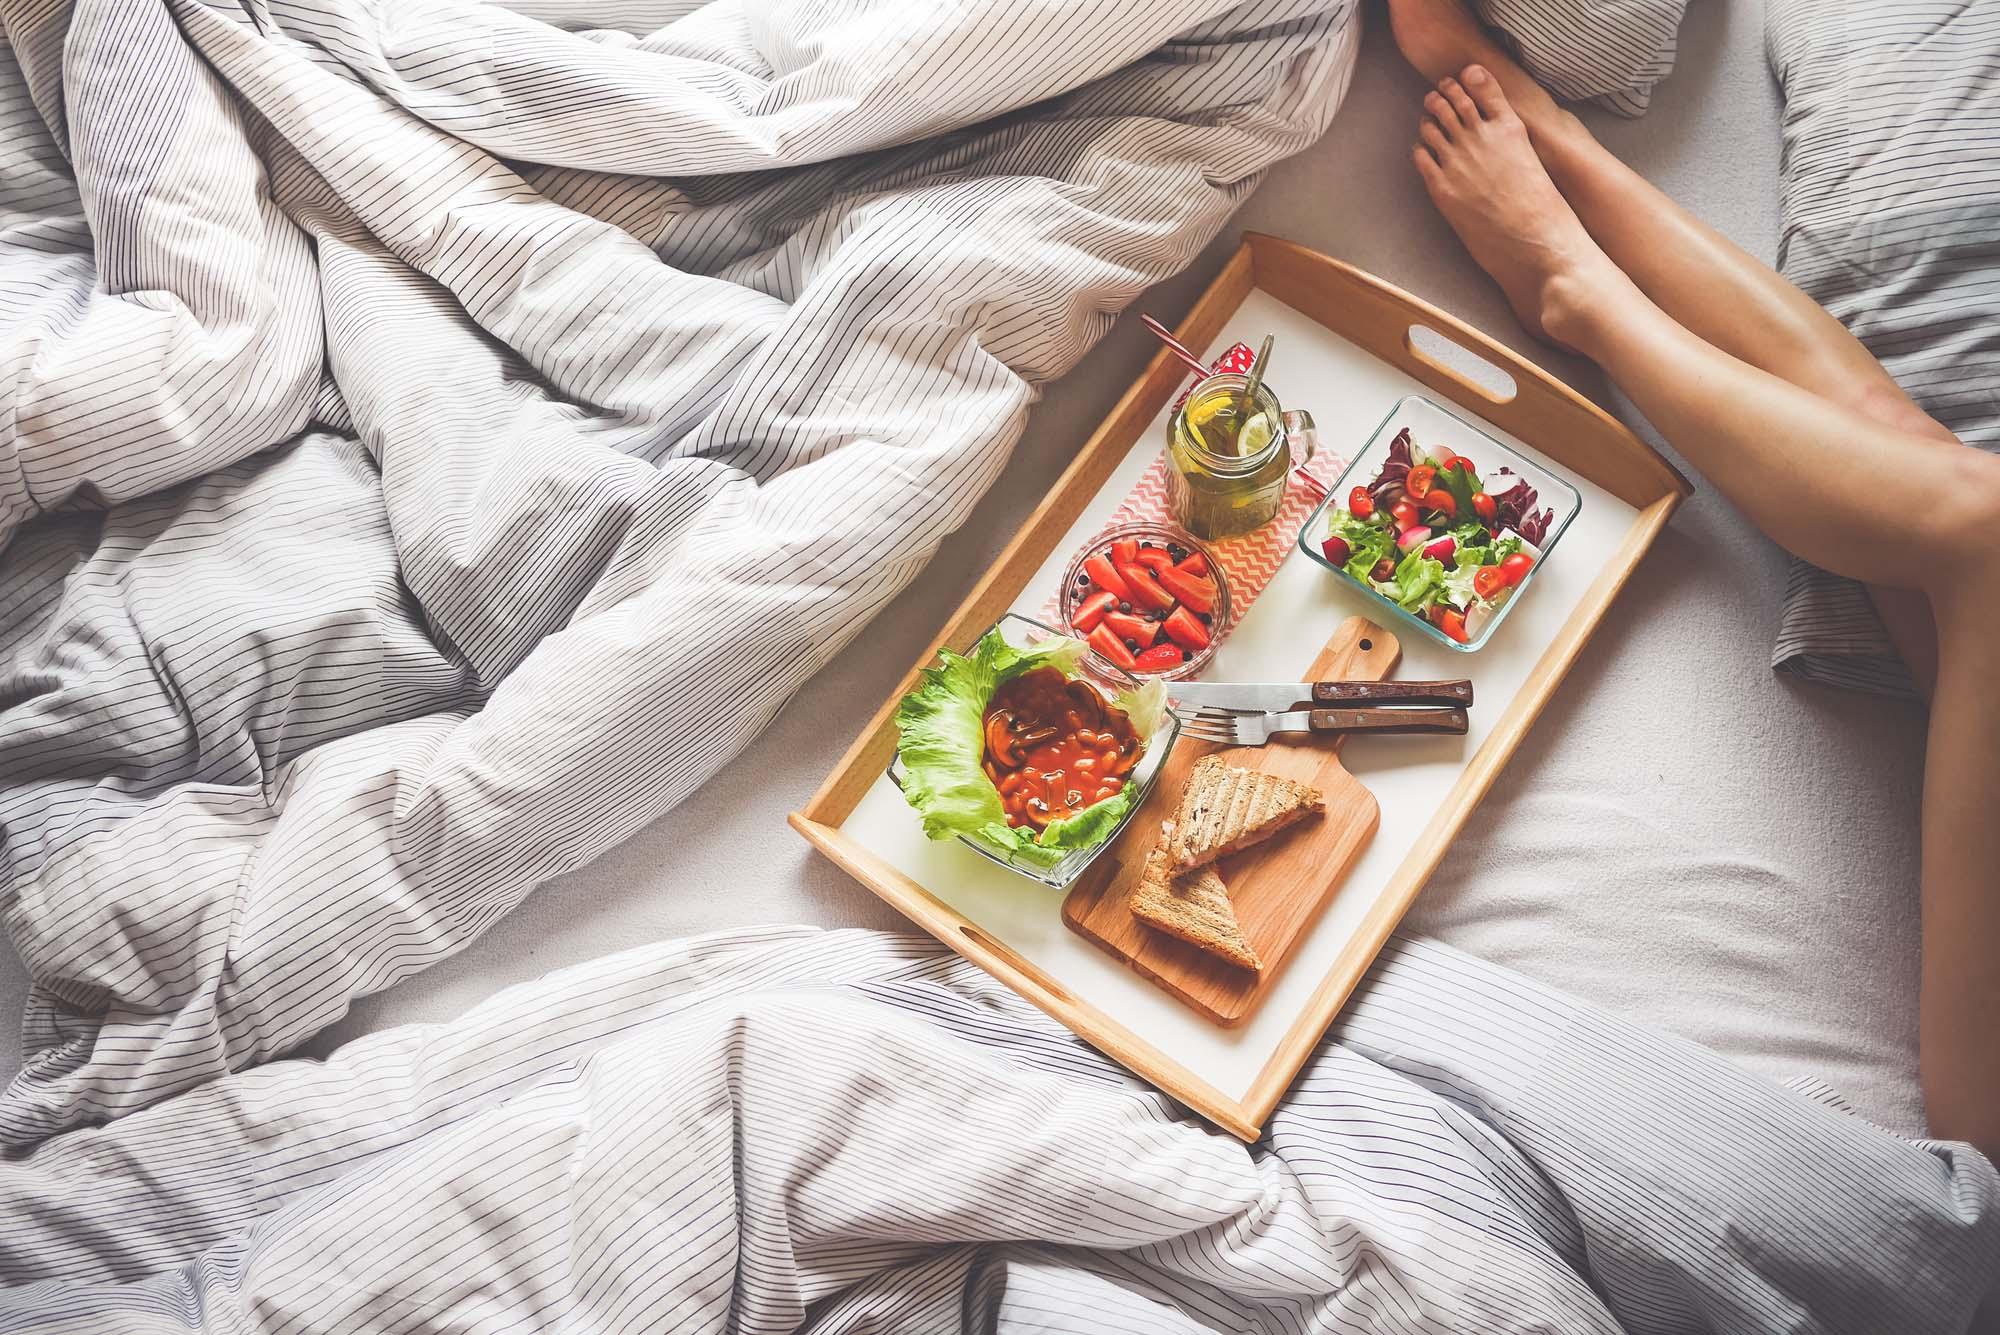 young-woman-enjoying-morning-breakfast-in-bed-picjumbo-com copy